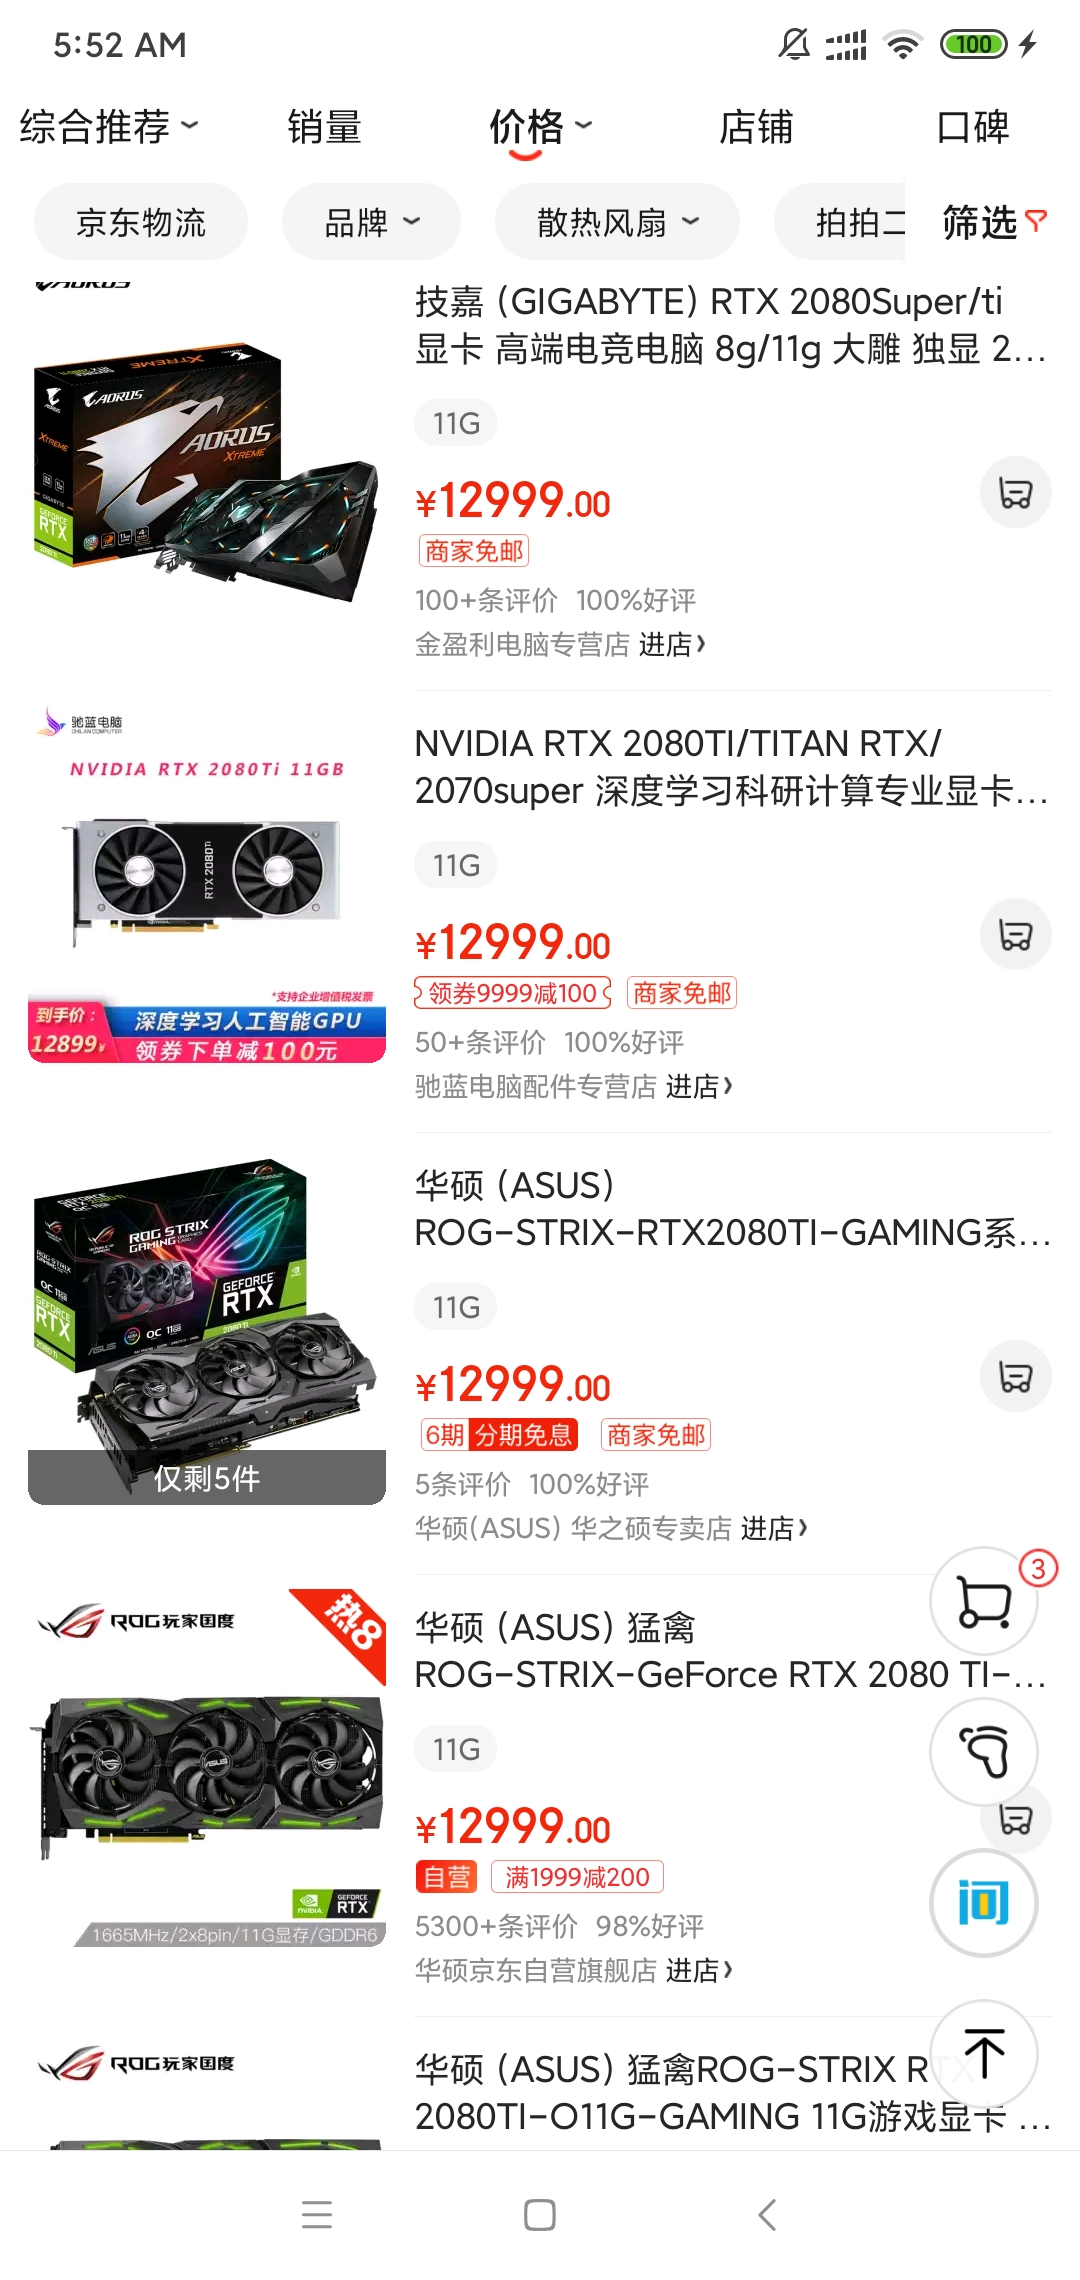 Screenshot_2020-08-18-05-52-39-034_com.jingdong.app.mall.jpg